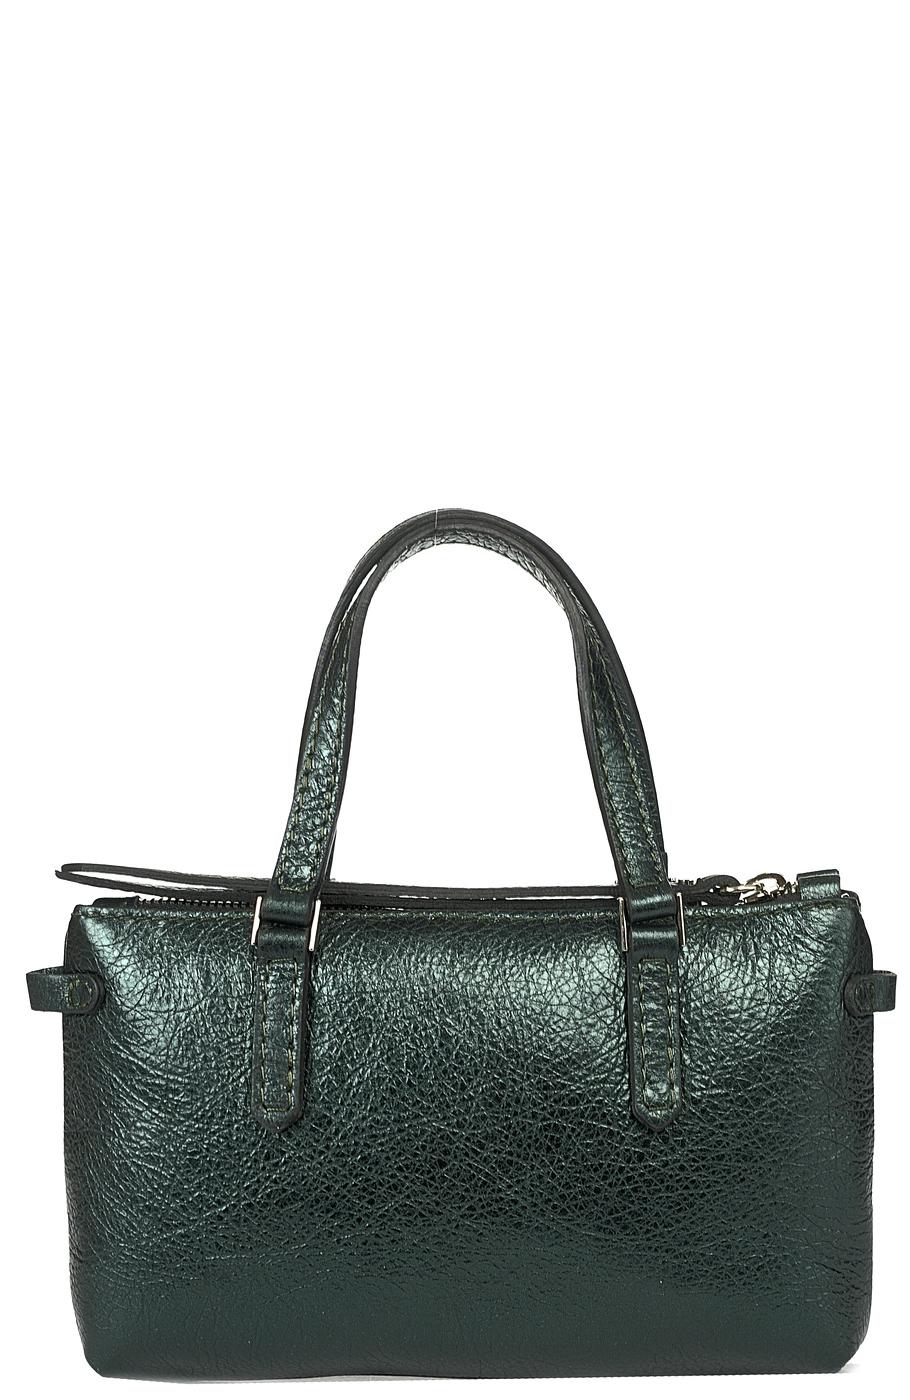 Клатч женский зеленый GIANNI CHIARINI B30839-BS6395